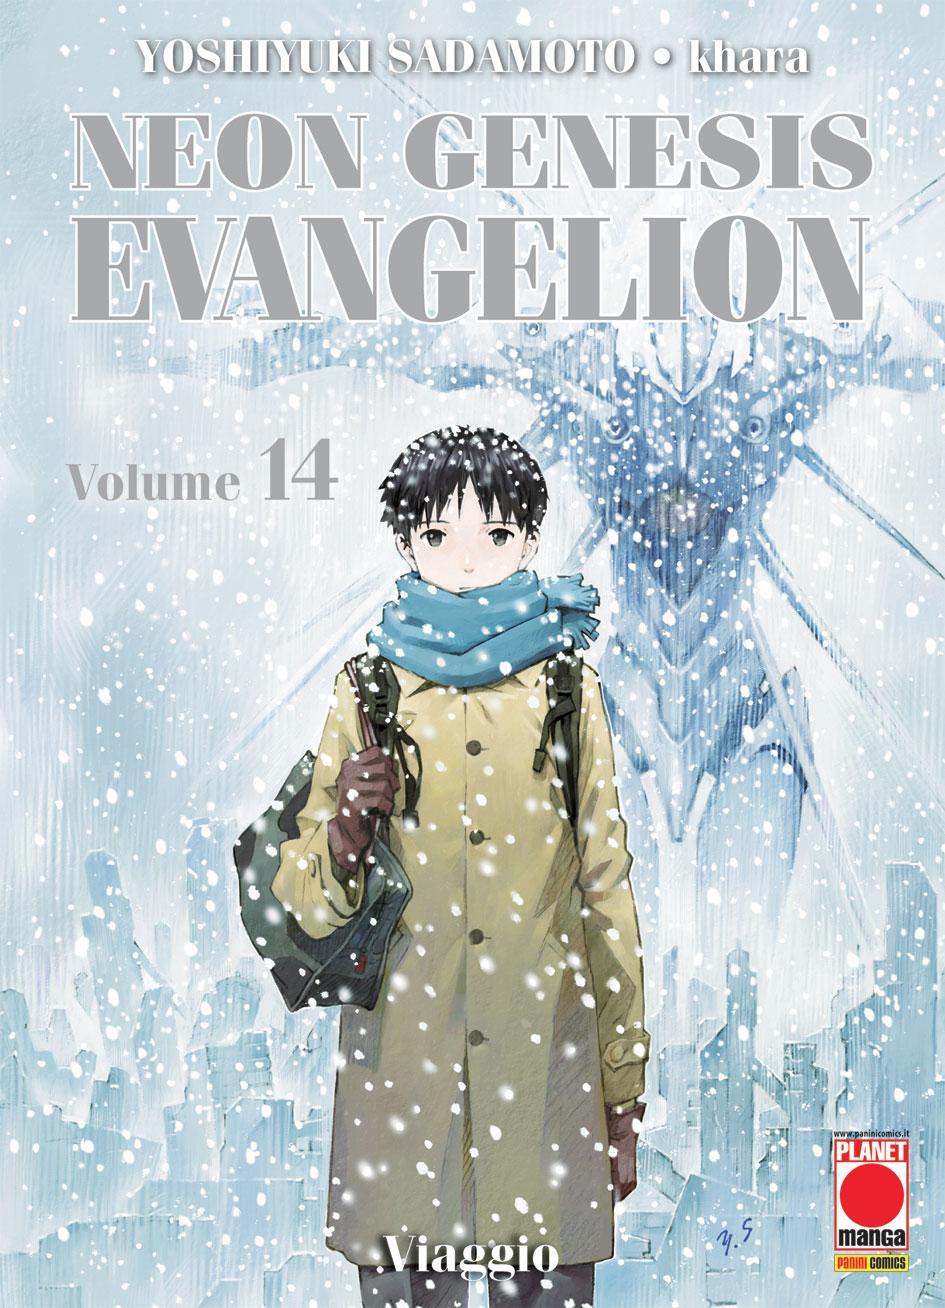 NEON  GENESIS EVANGELION N.   14 - NEW COLLECTION